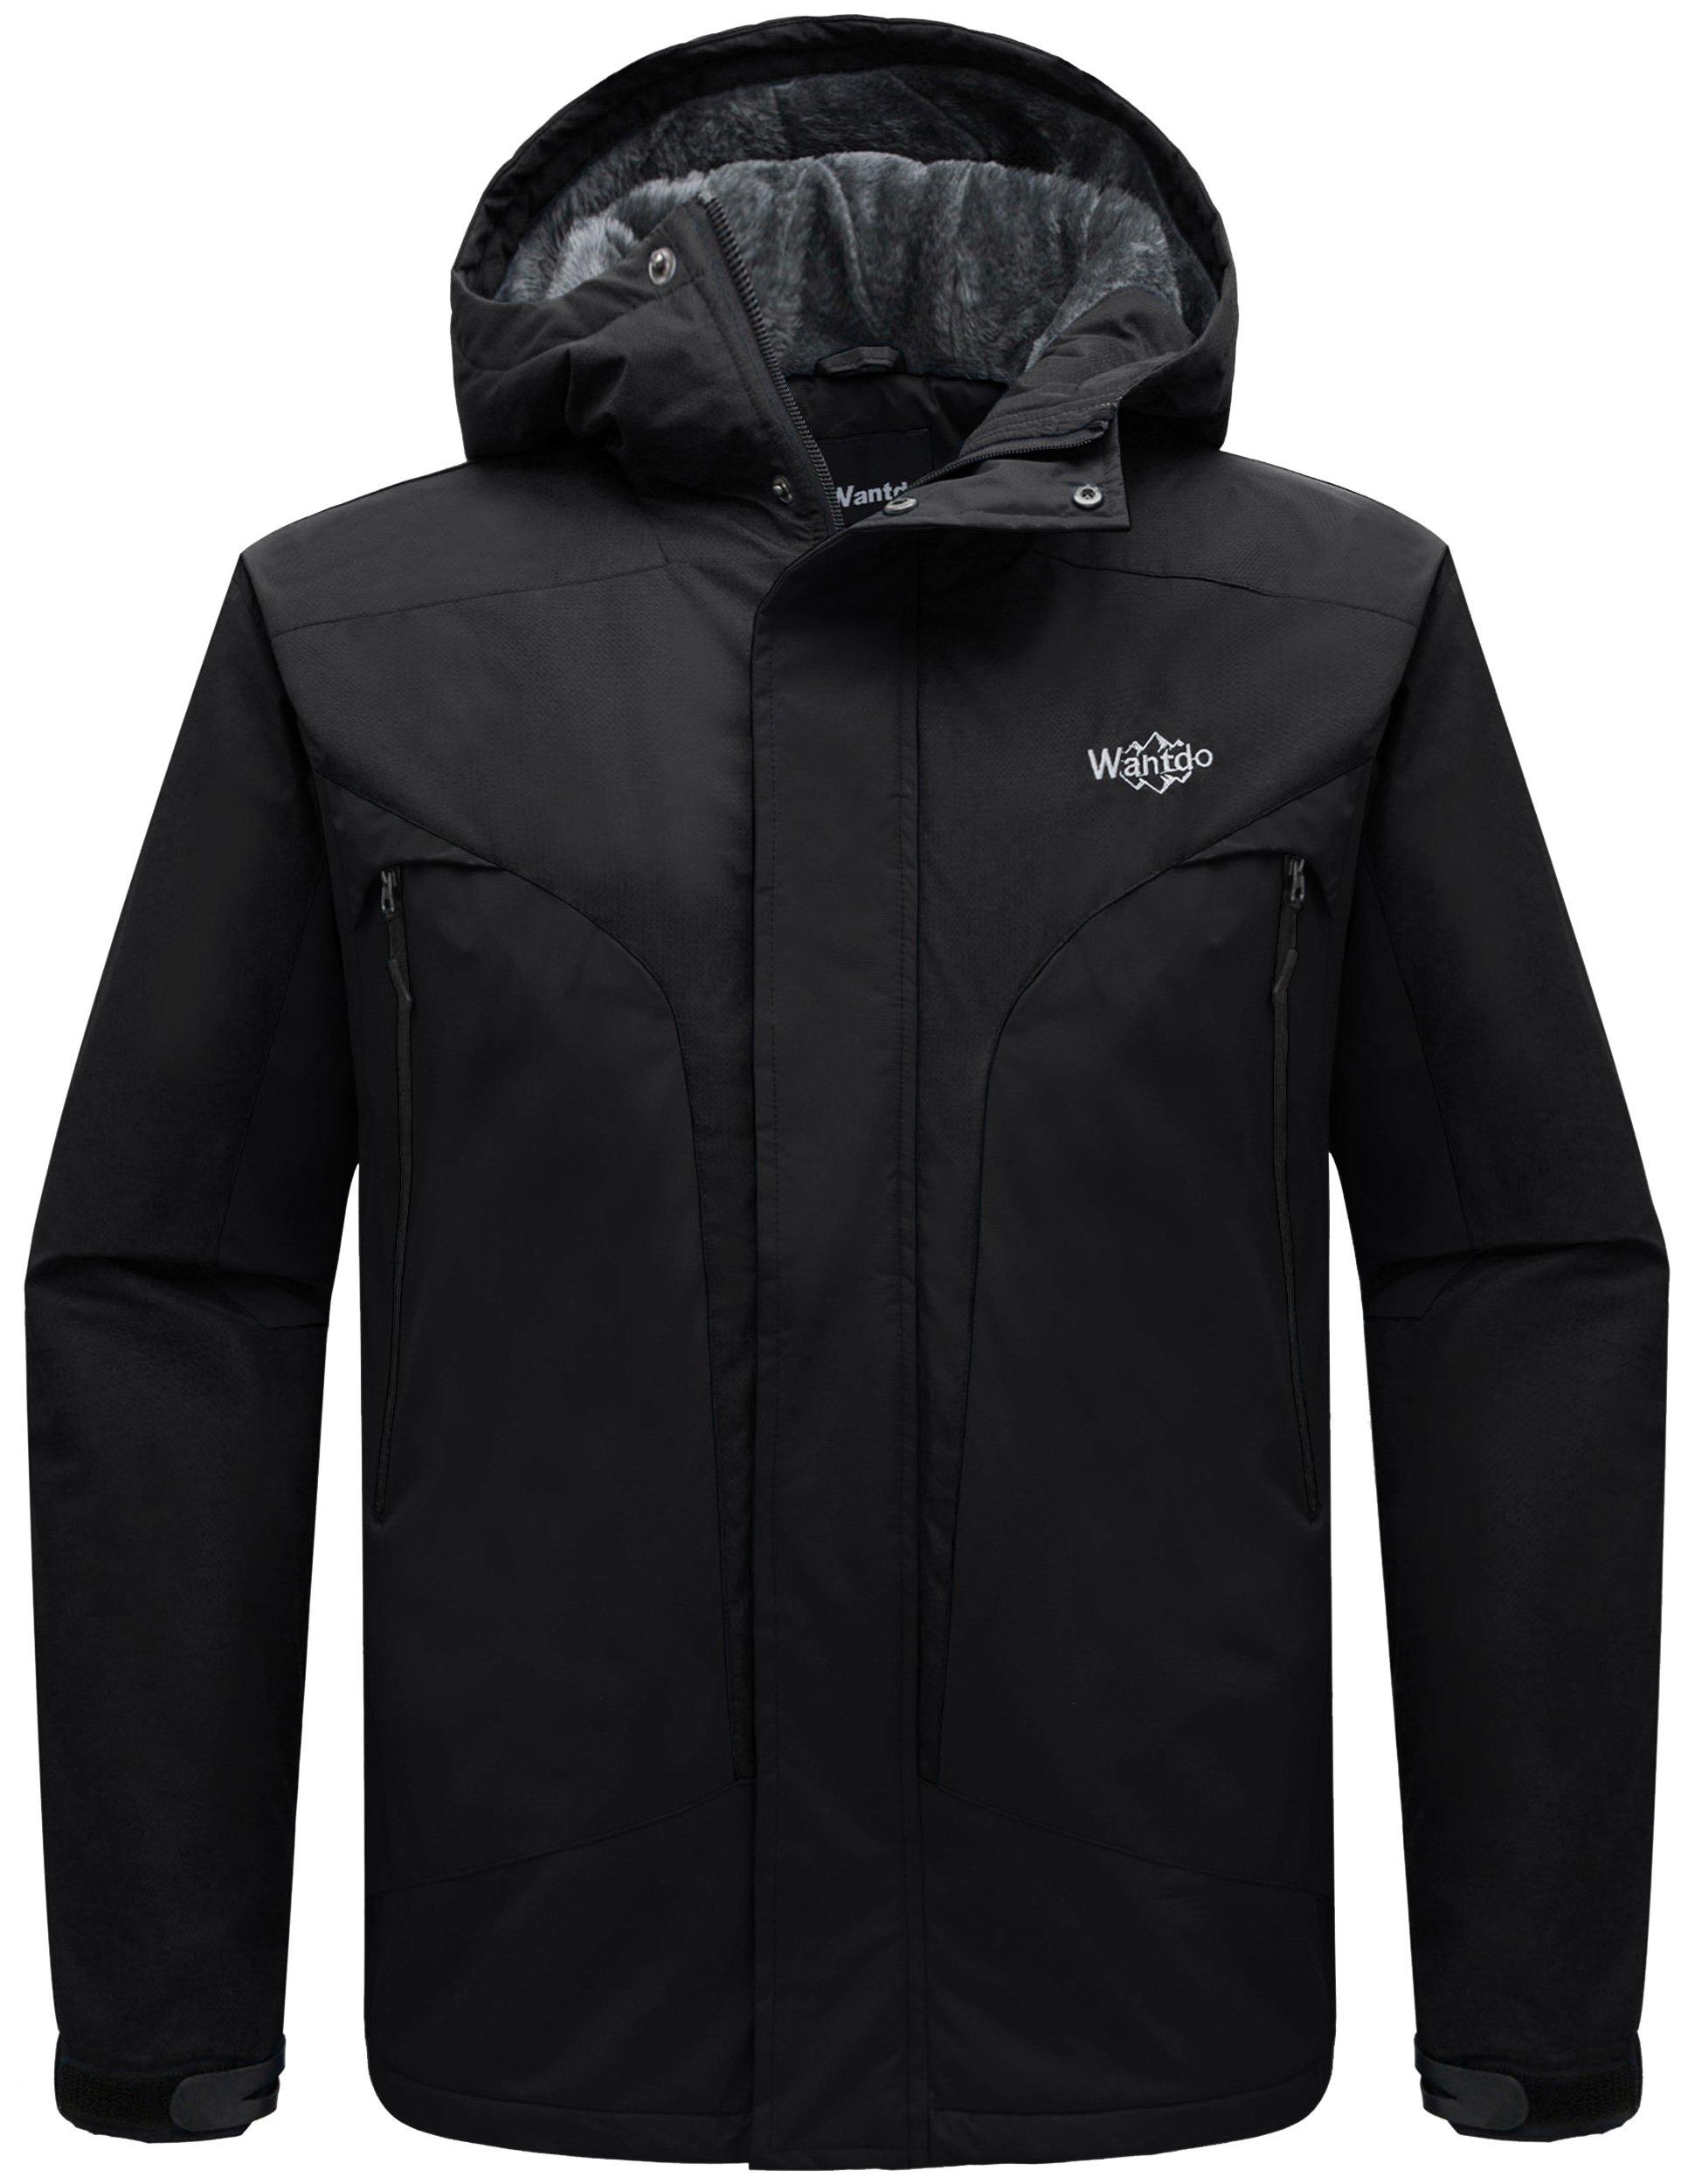 Wantdo Men's Detachable Hood Waterproof Rain Jacket Fleece Windproof Ski Jacket Black US Medium